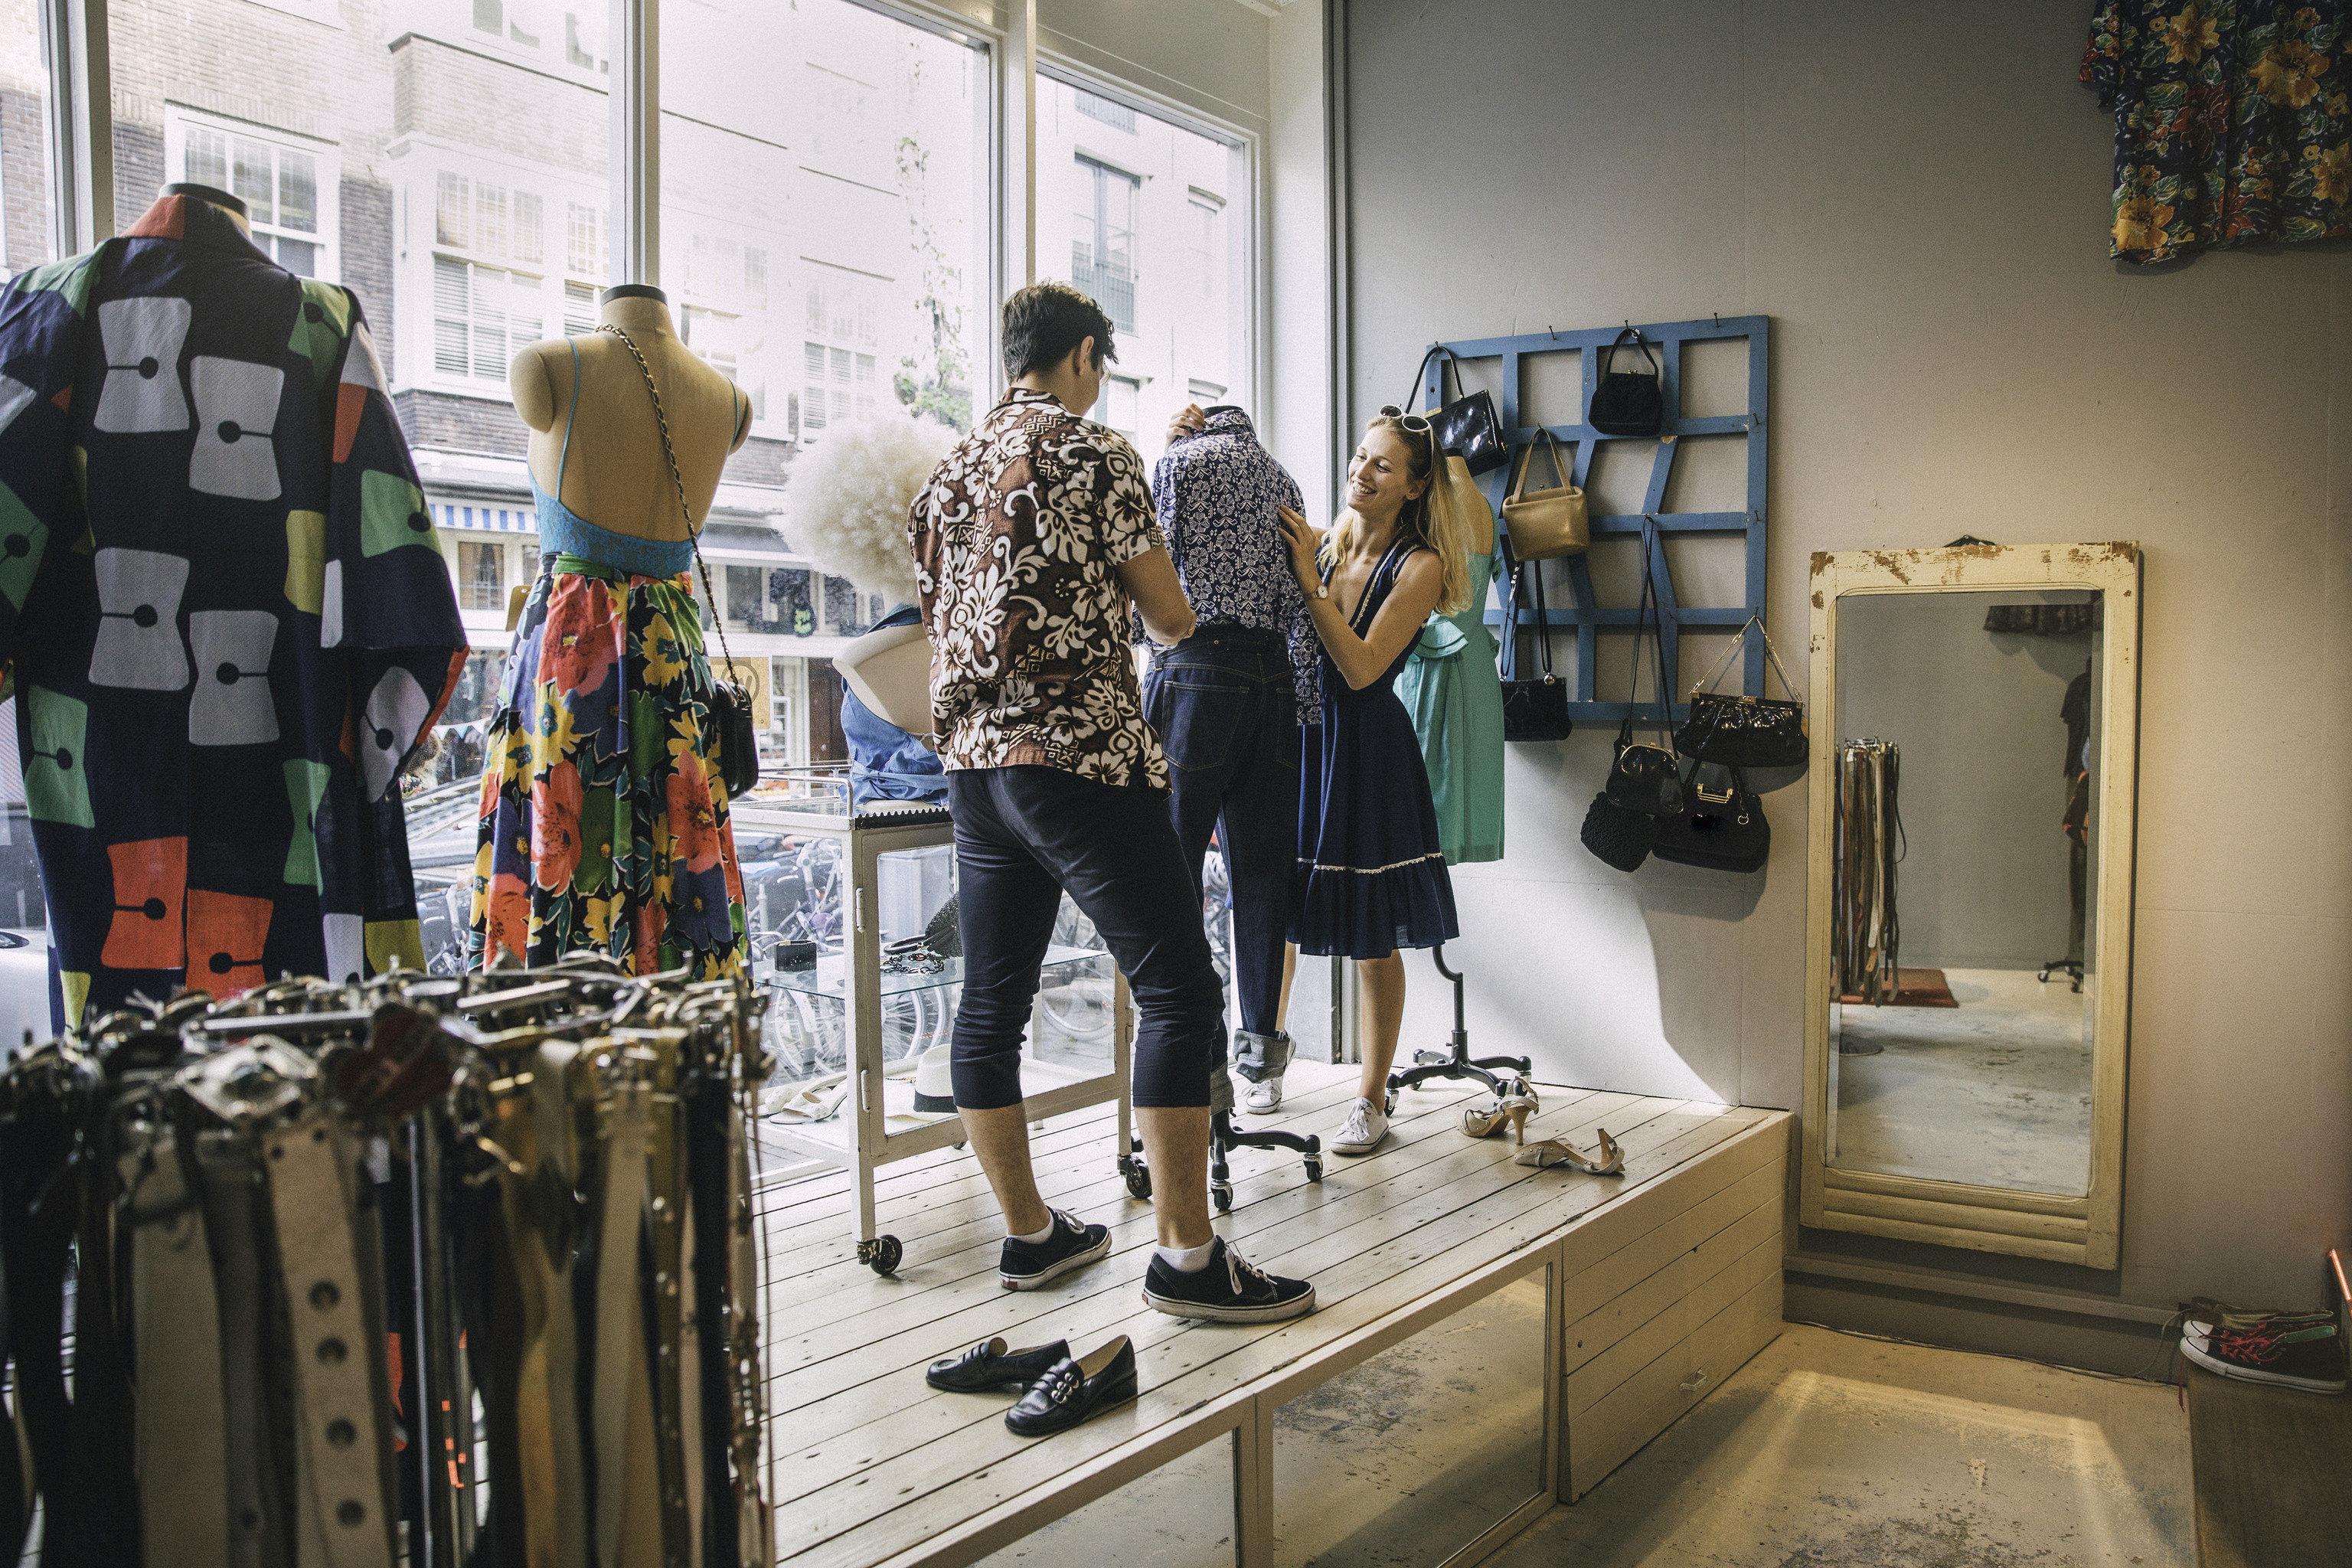 Travel Shop indoor person display window Boutique fashion Design retail interior design buyer shopping window